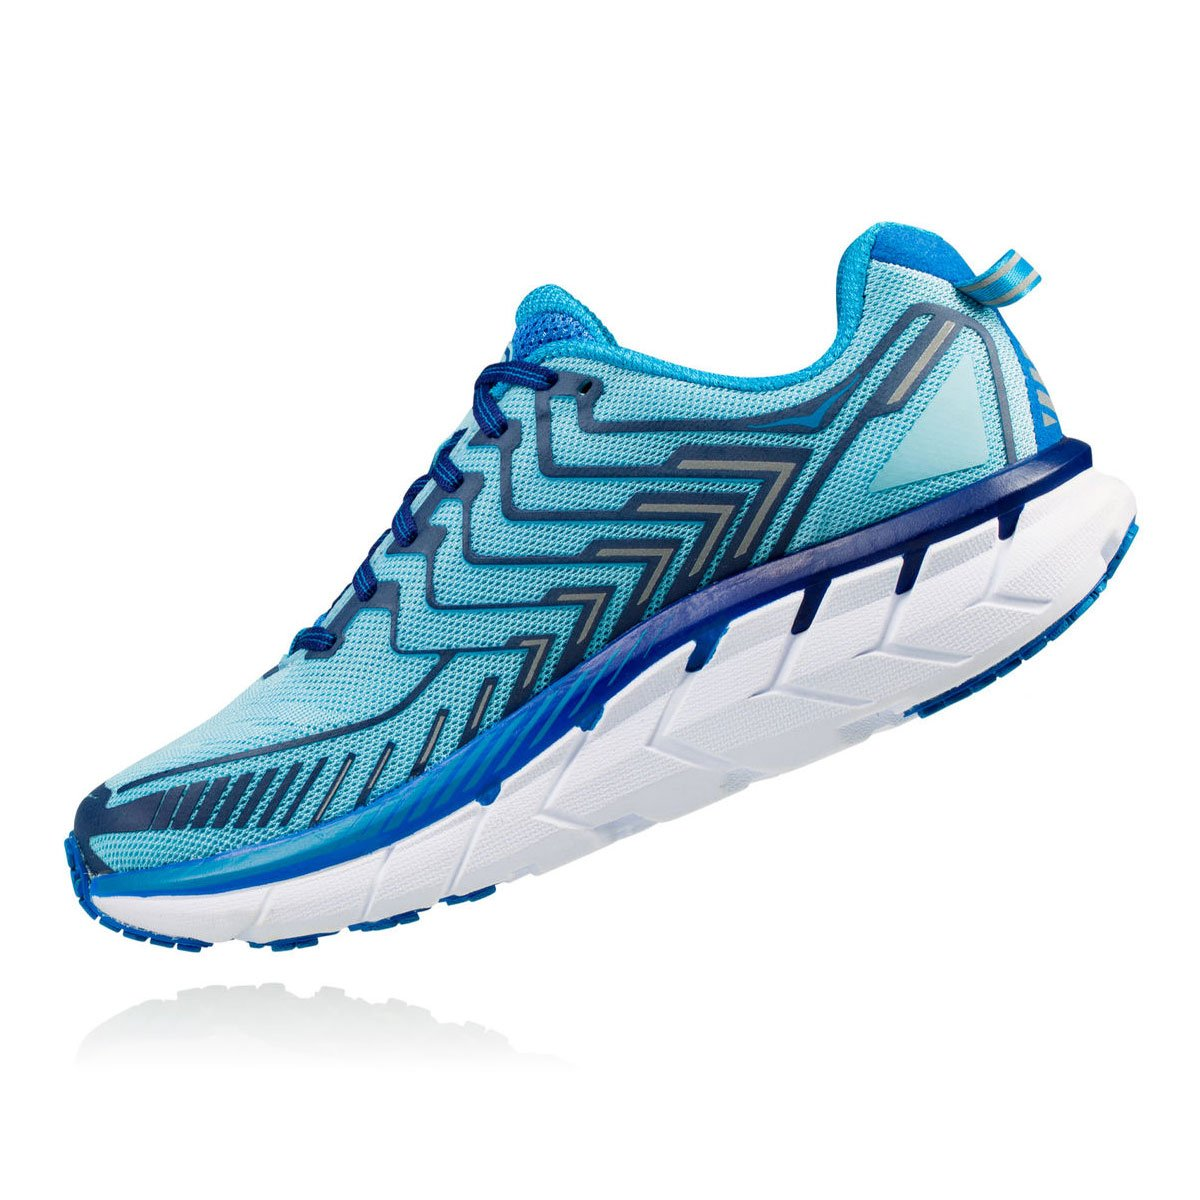 HOKA ONE ONE Women's Clifton 4 Running Shoe B01N1UK0GY 10.5 B(M) US|Blue Topaz/Imperial Blue